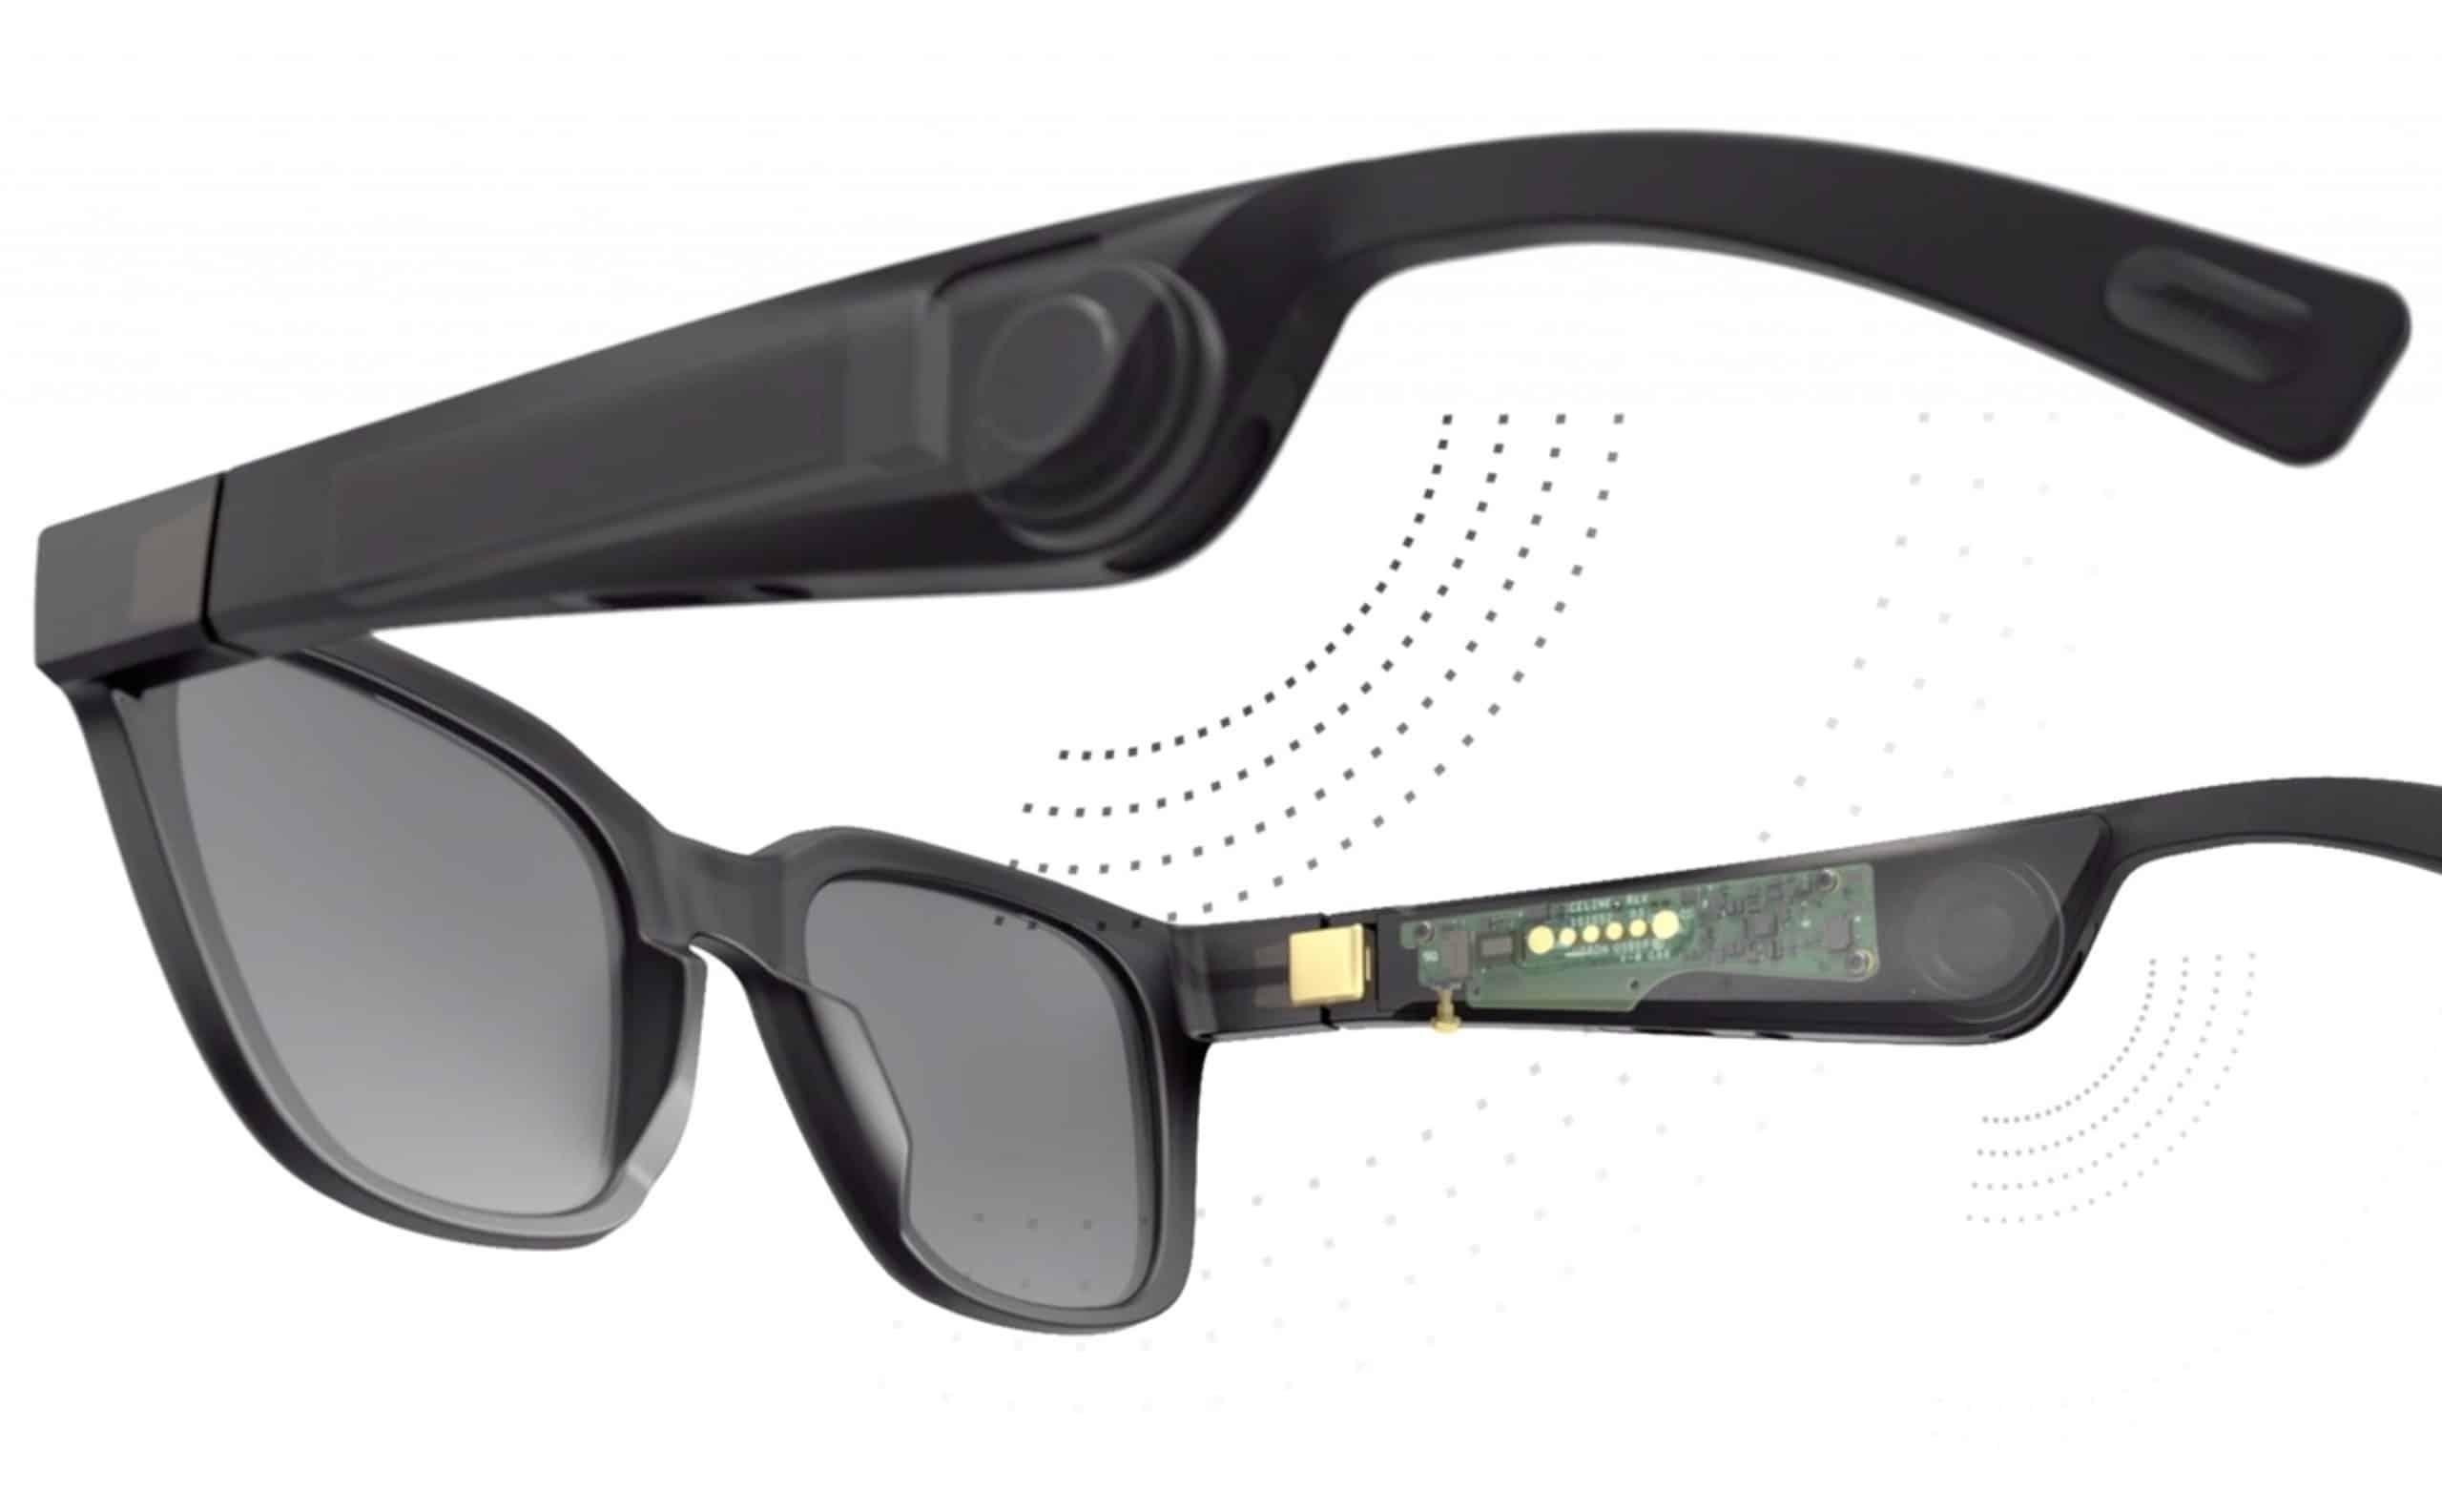 Bose Frames Audio Sunglasses 2